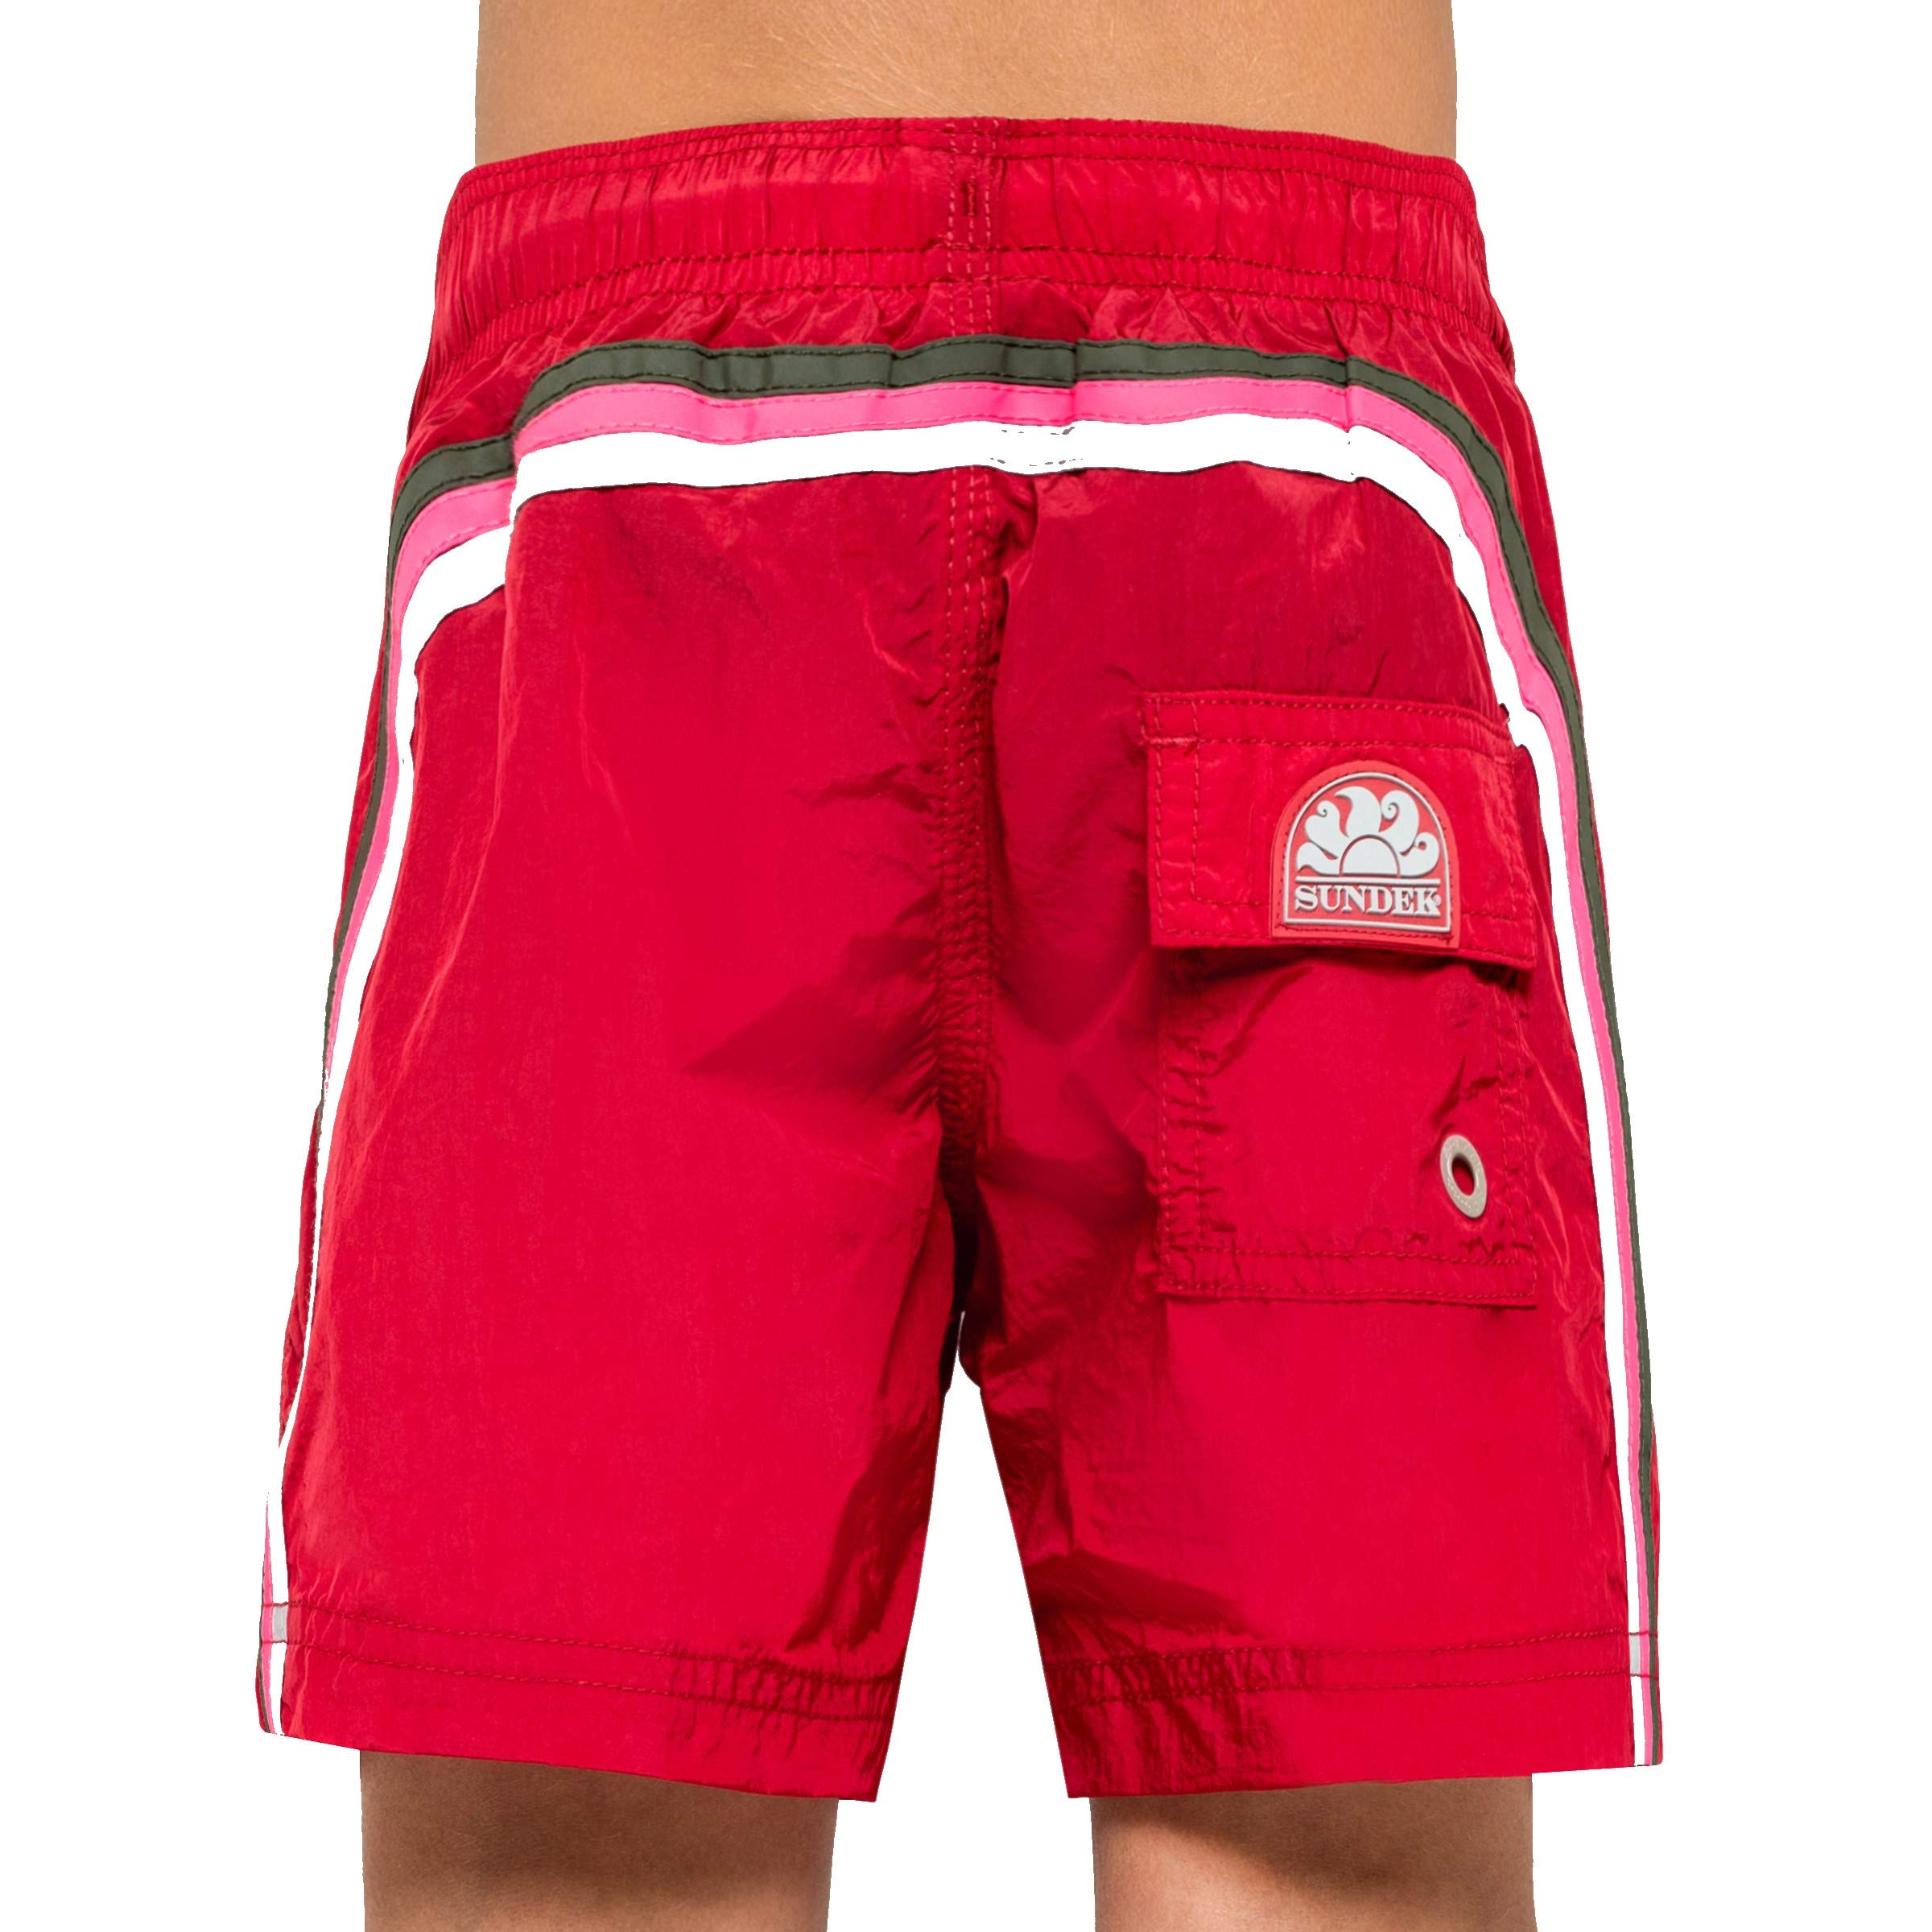 Sundek Classic Boy's Shorts - 10'' Long - with Rainbow ON The Back